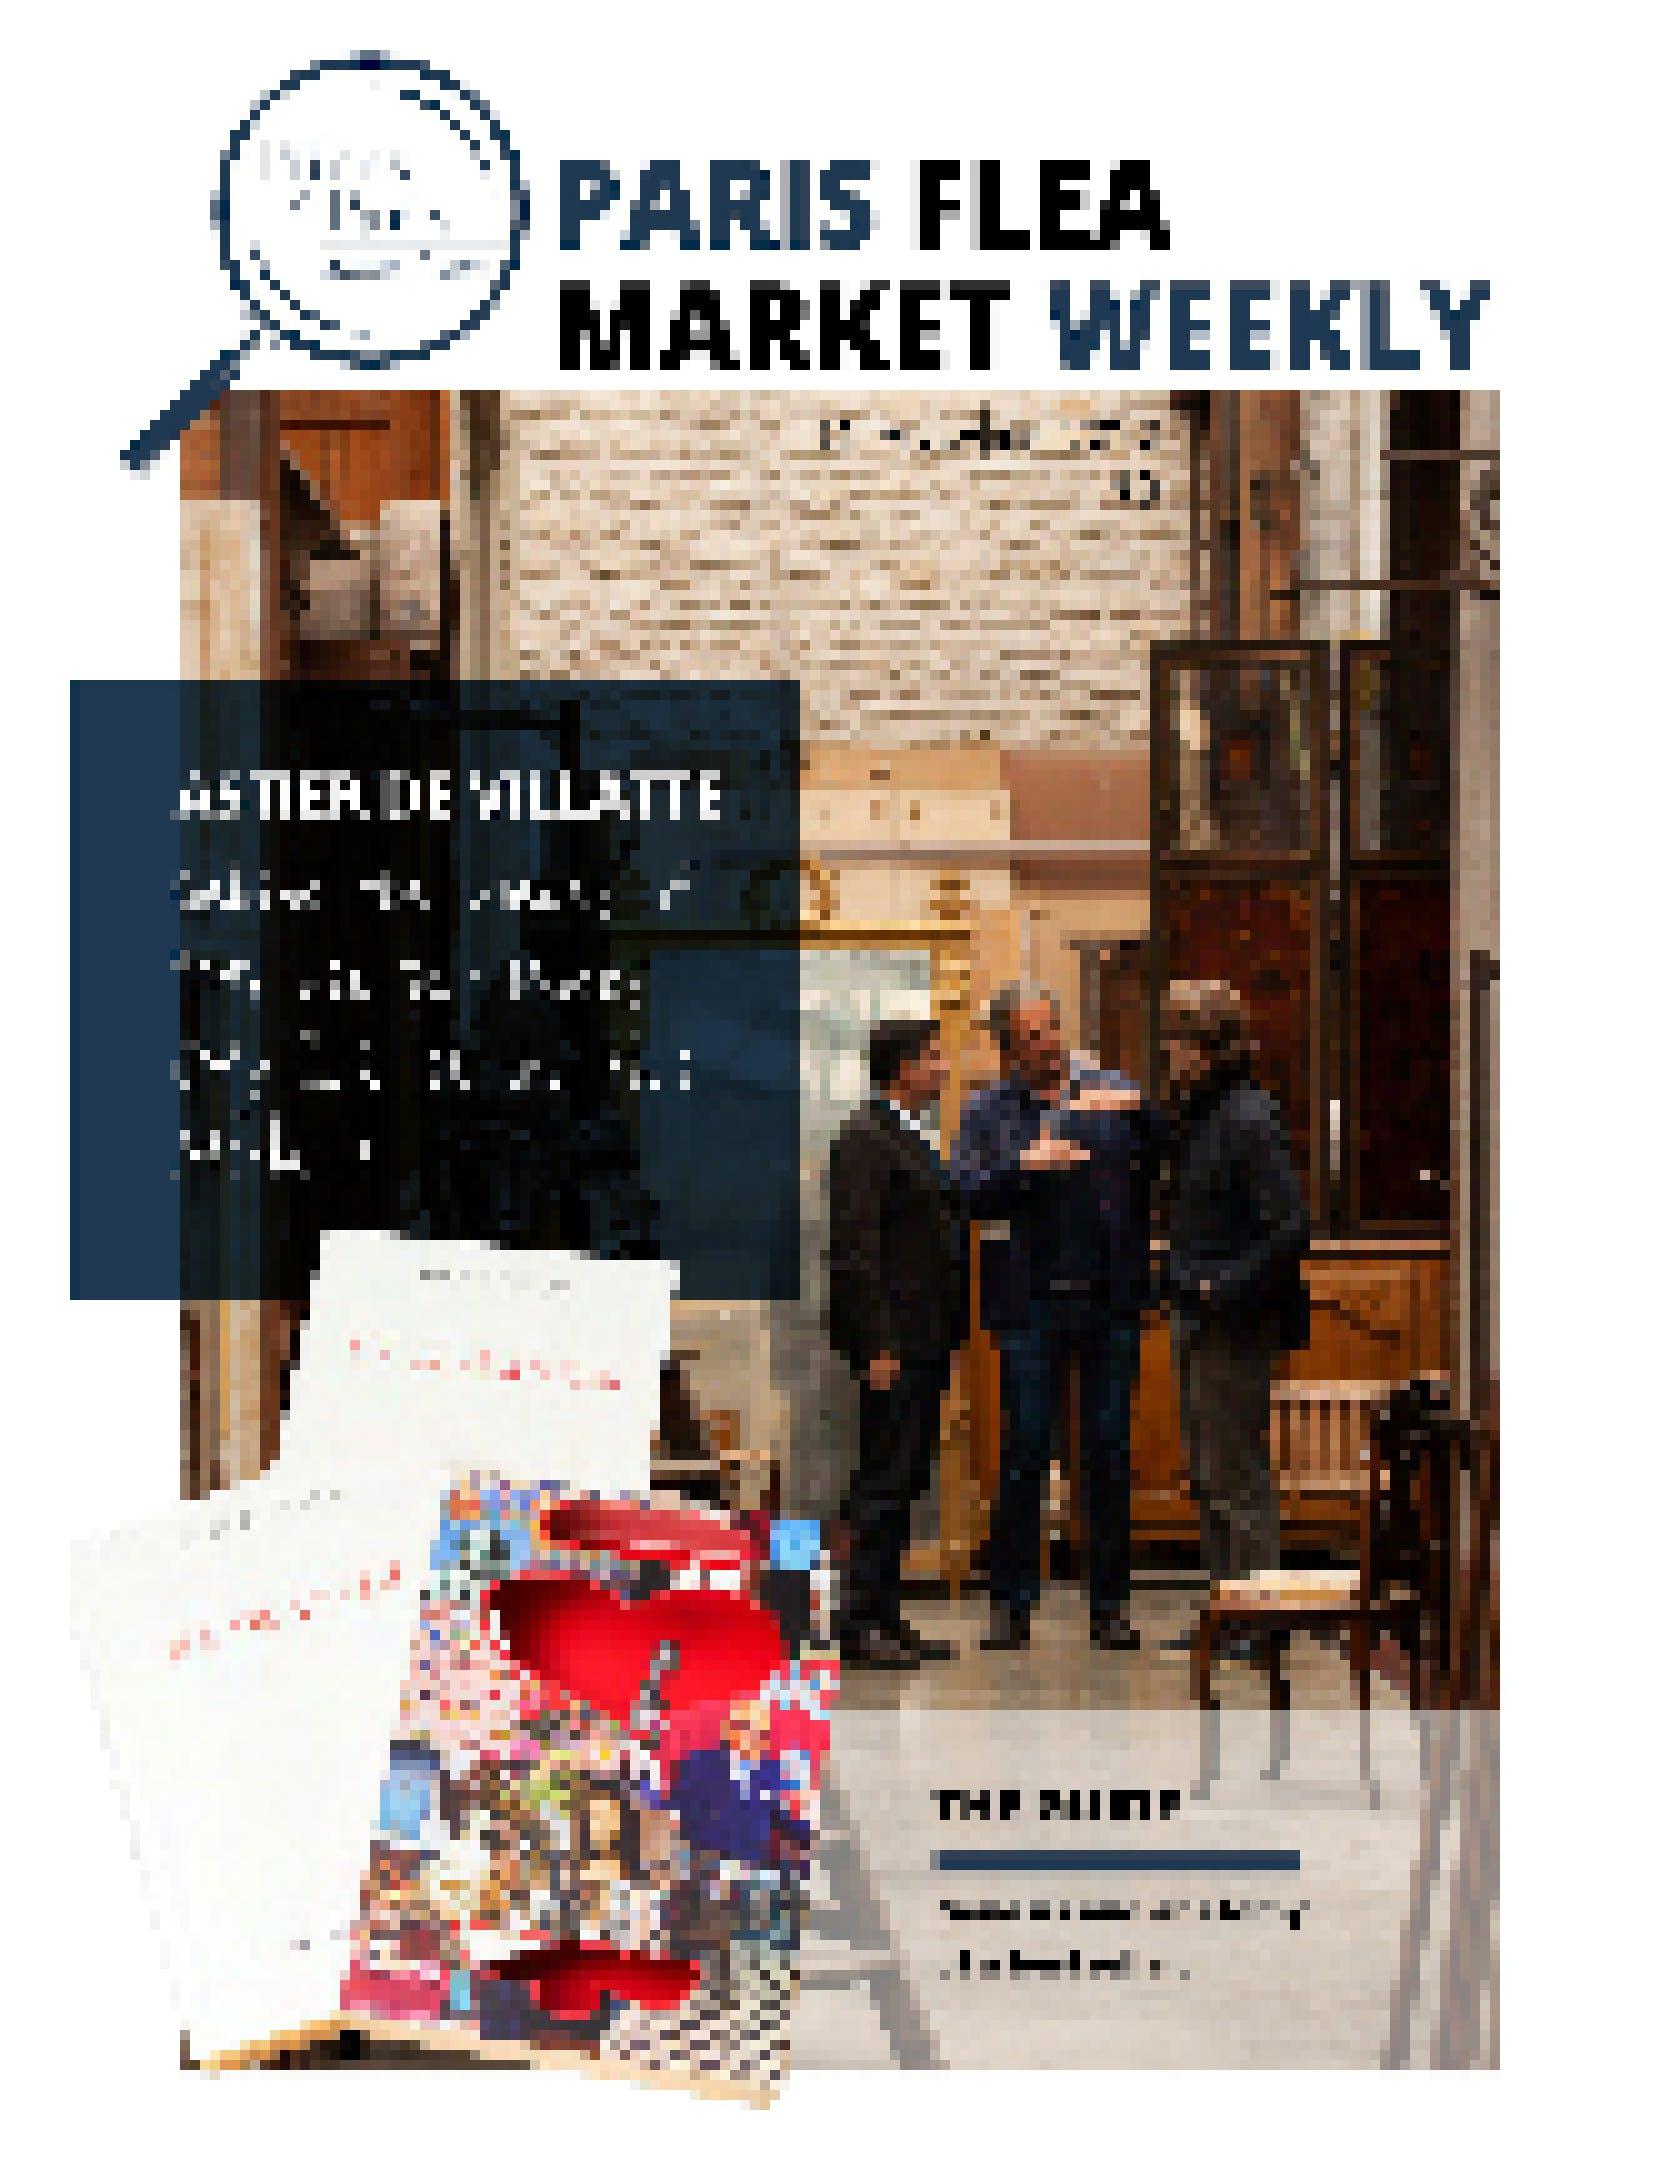 The Paris Flea Market Weekly N° 9 Cover